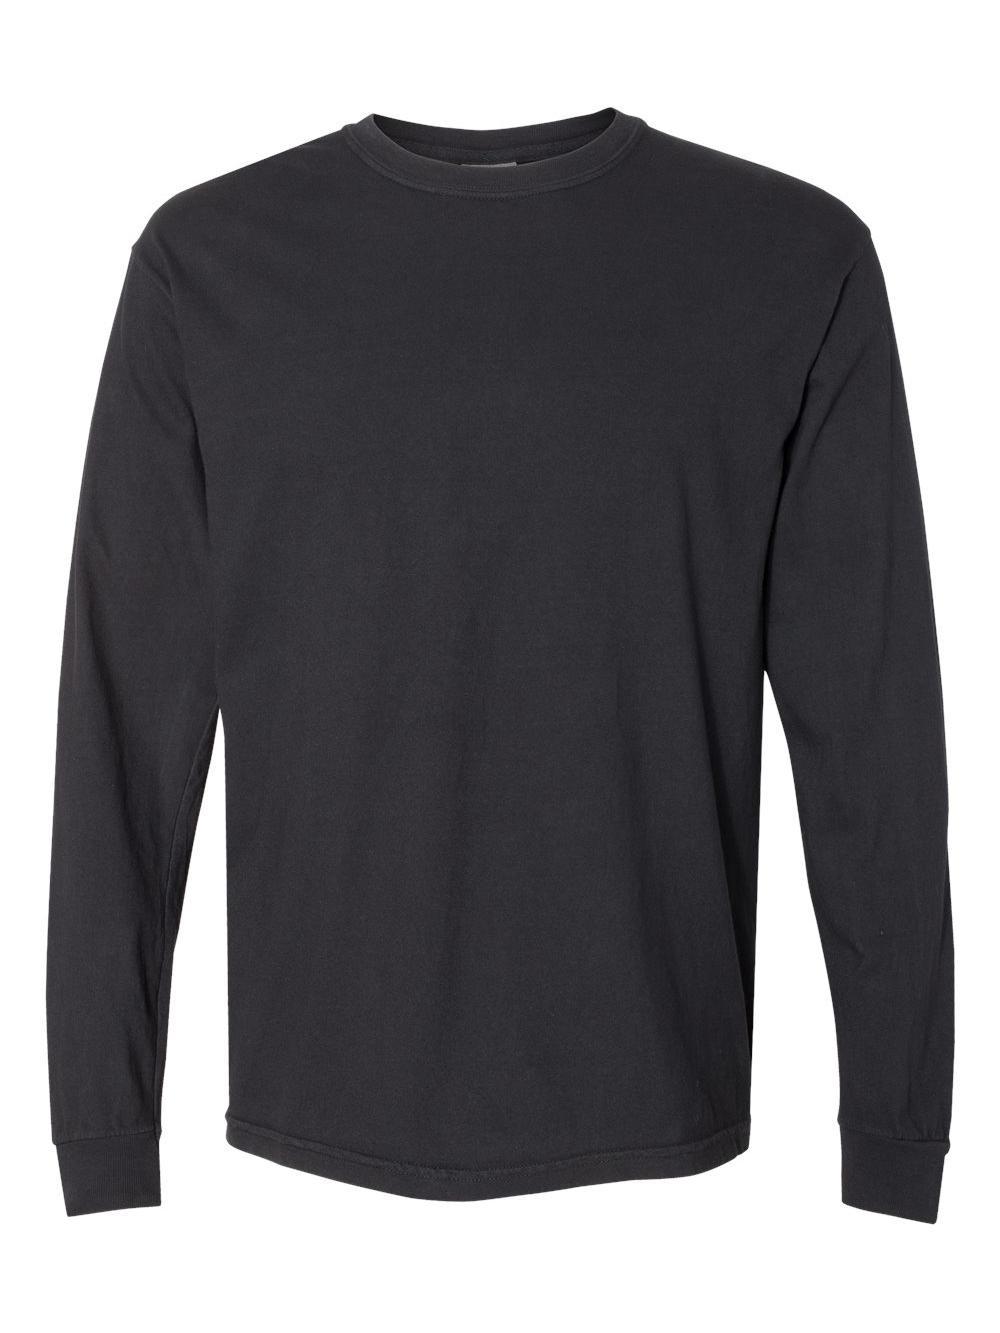 Comfort-Colors-Garment-Dyed-Heavyweight-Ringspun-Long-Sleeve-T-Shirt-6014 thumbnail 6